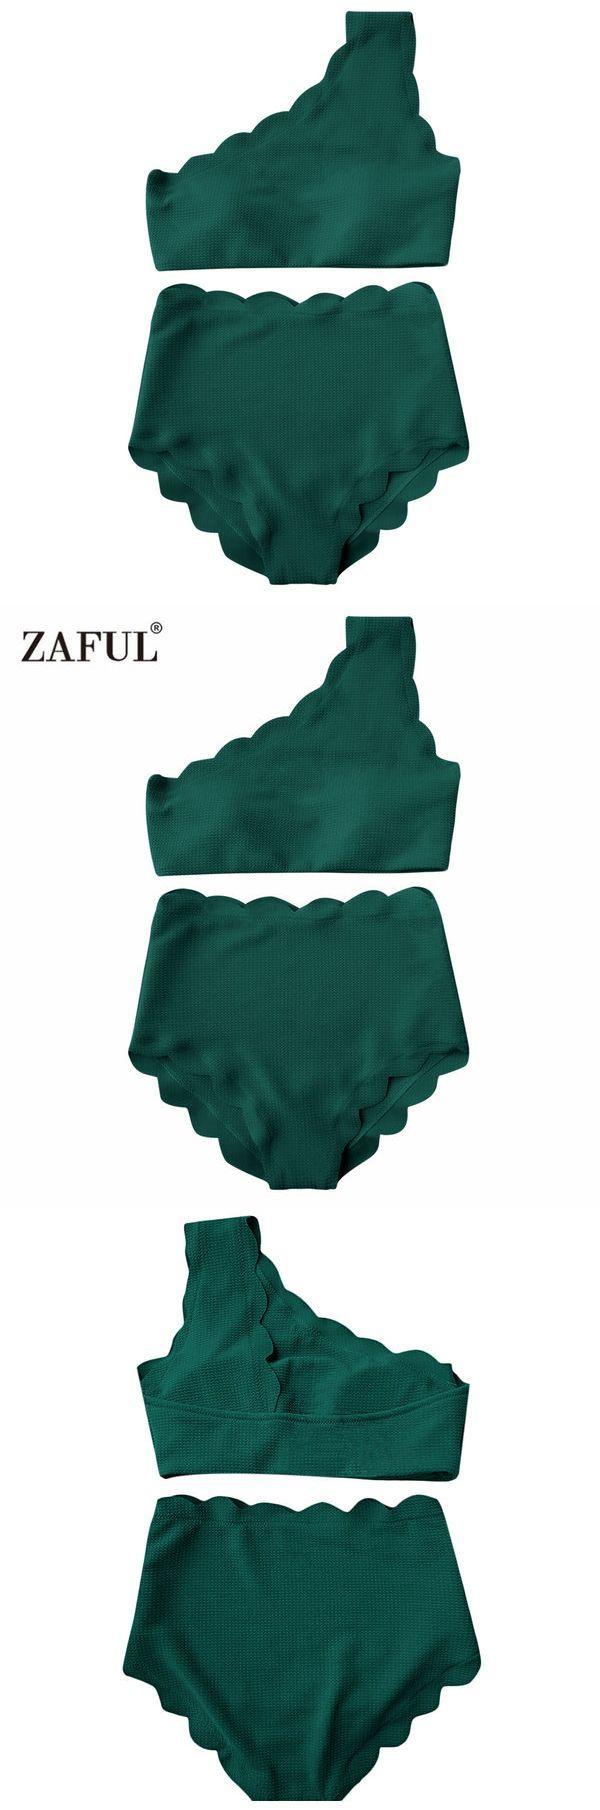 dac9978bb7 Zaful One Shoulder Woman Bikini Set 2018 Scalloped Swimwear Wave Edge Women  Swimsuit Biquinis Bathing Suits Maillot De Bain #swimwear #swimsuit # swimsuits ...